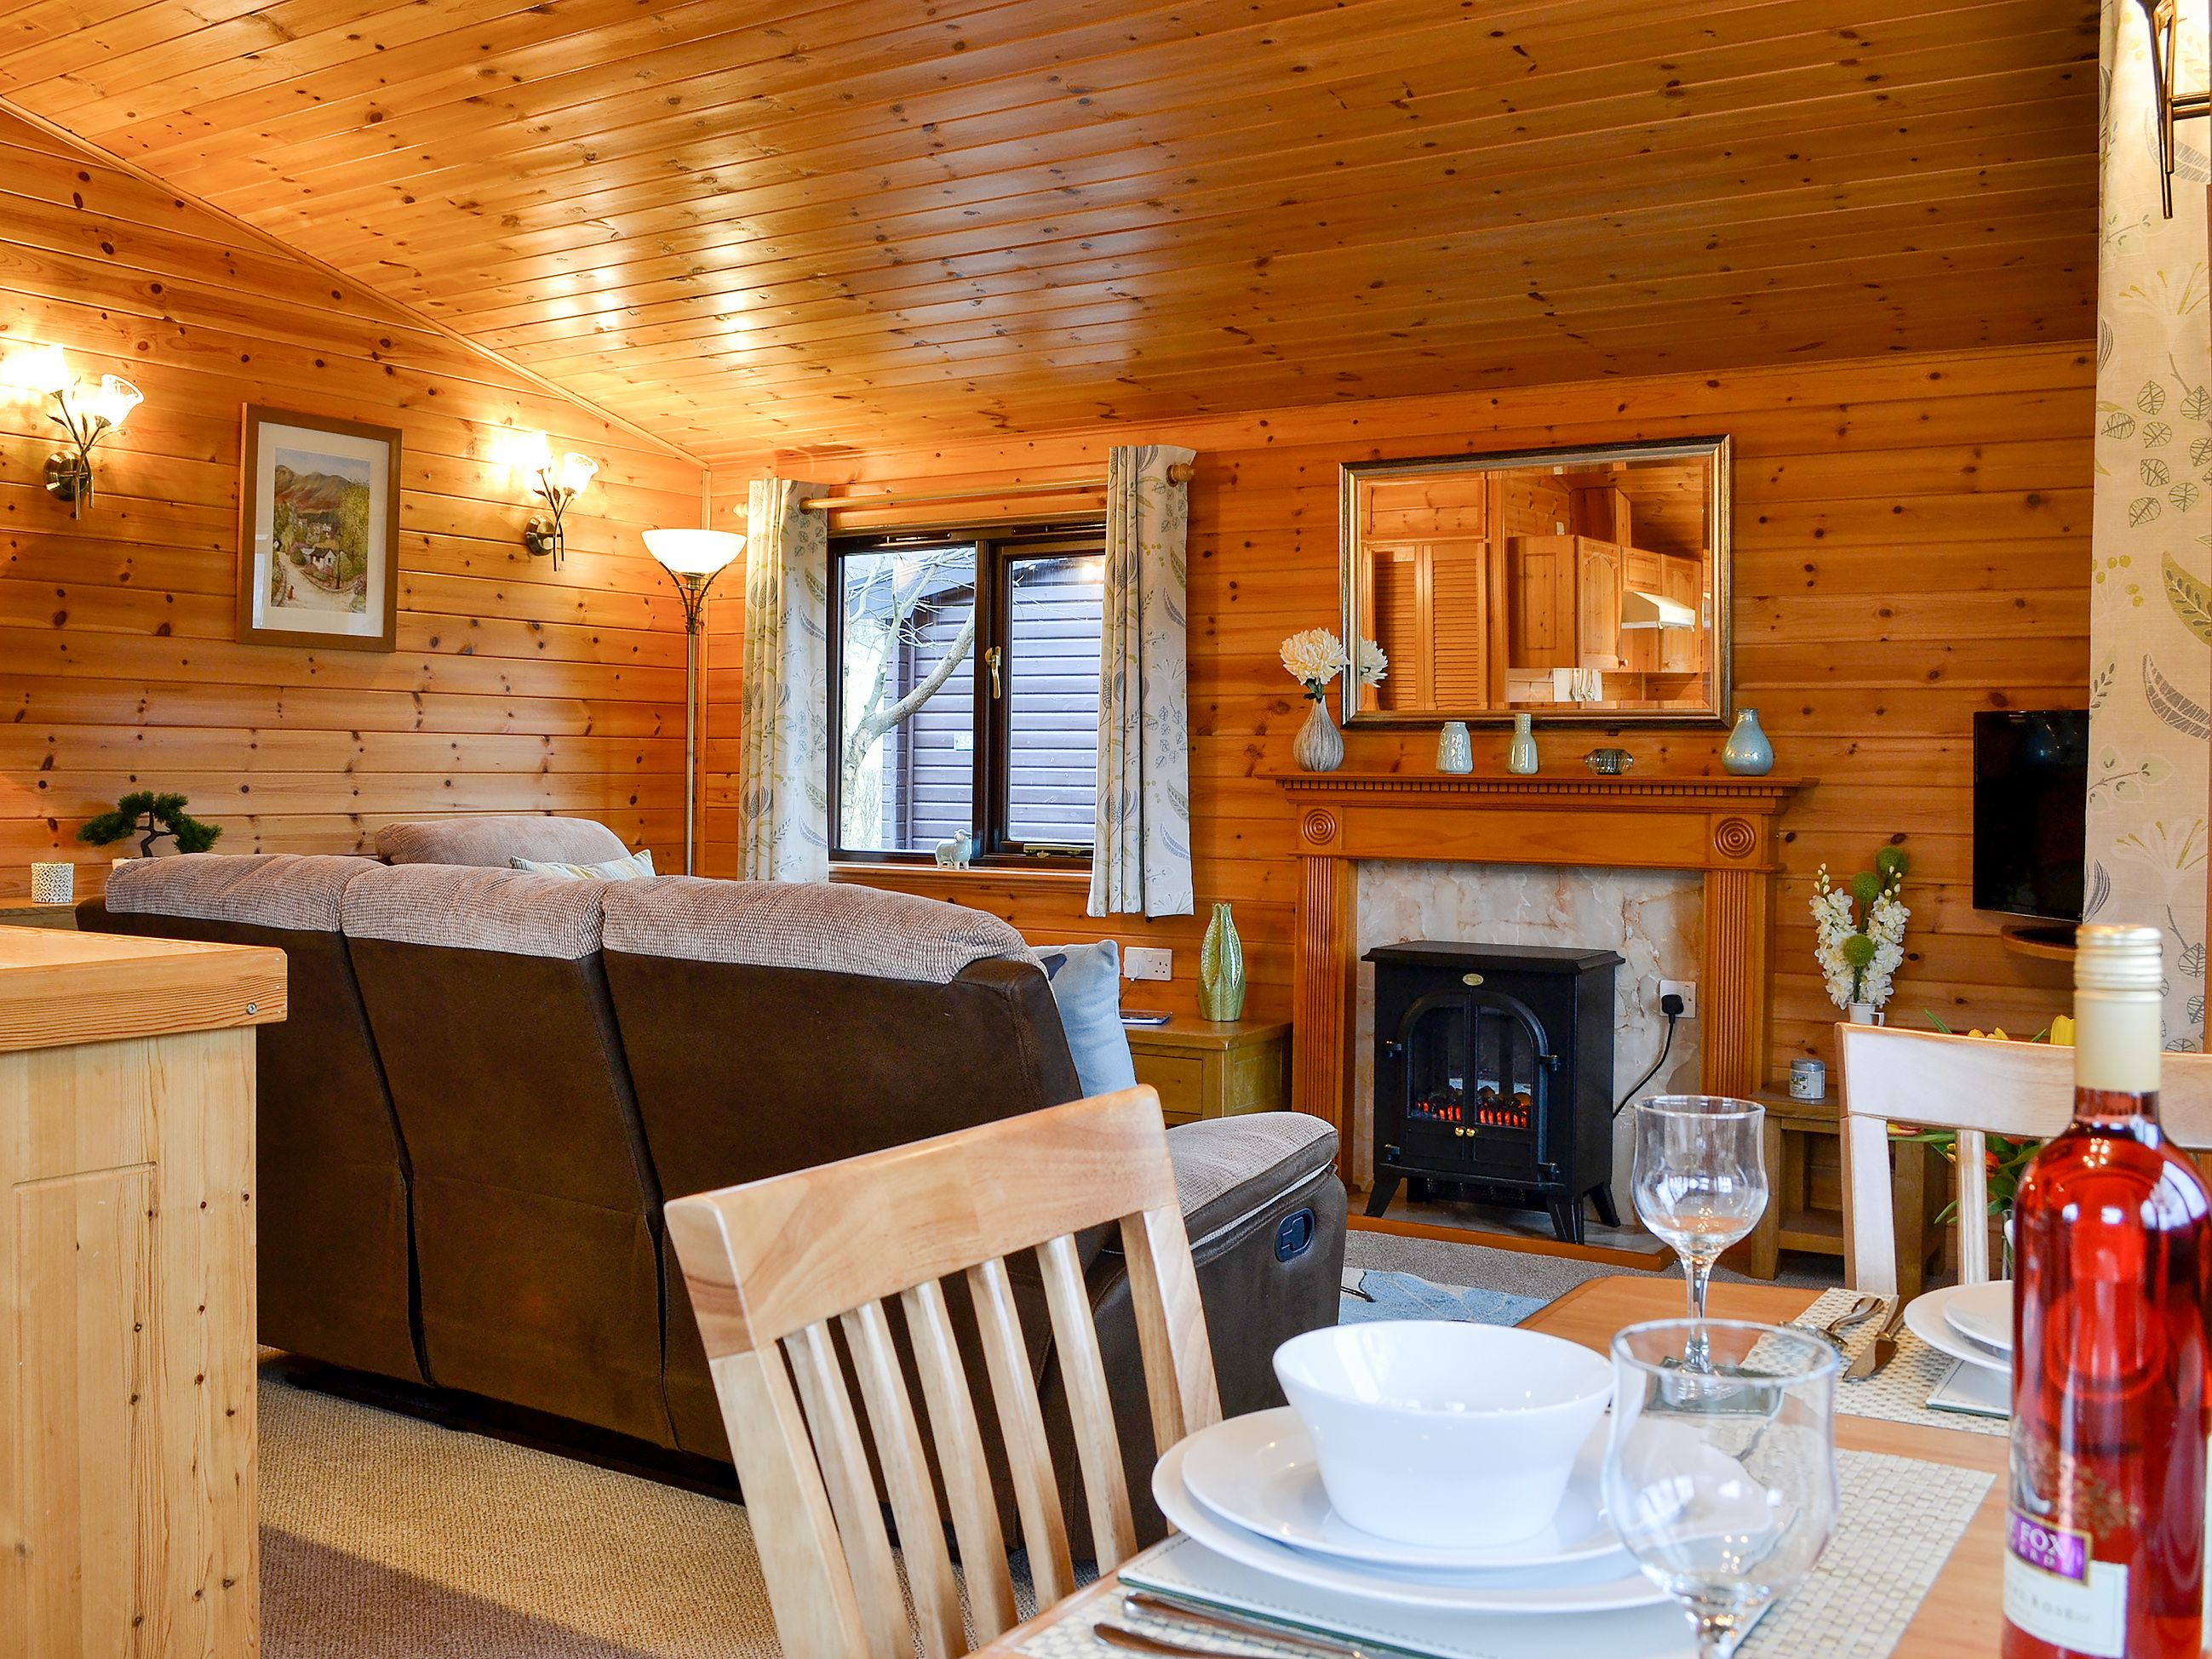 Burnside Park Borrowdale Lodge Ref Uk1271 In Keswick Cumbria